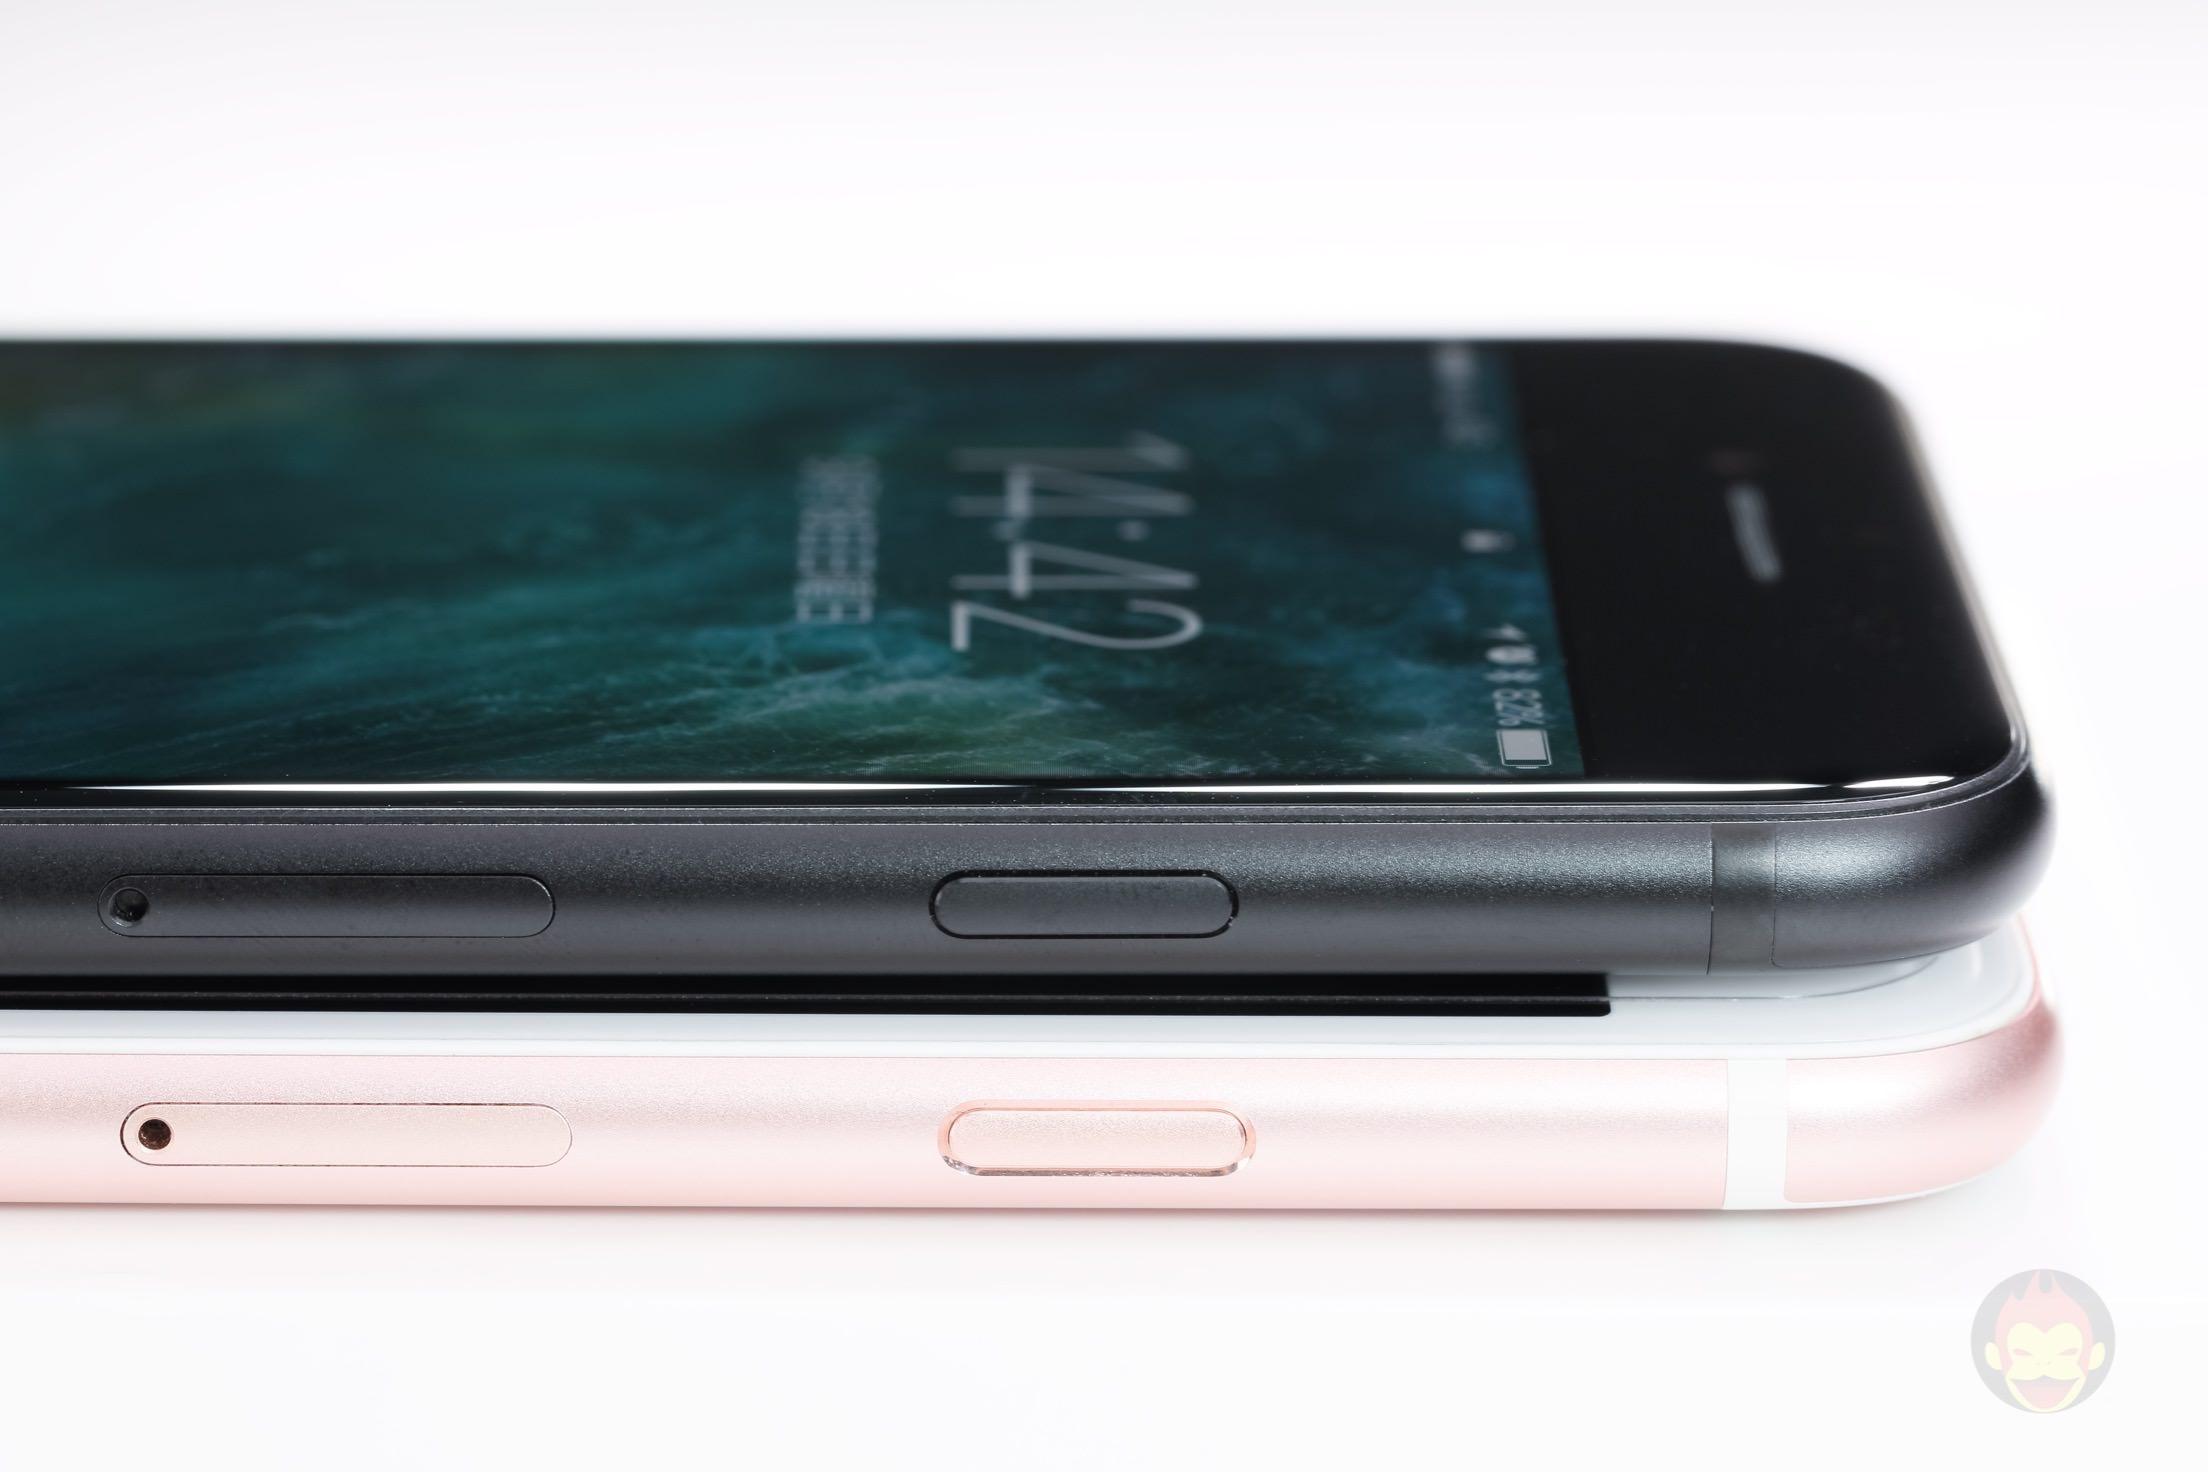 iPhone-7-iPhone-6s-Comparison-03.jpg